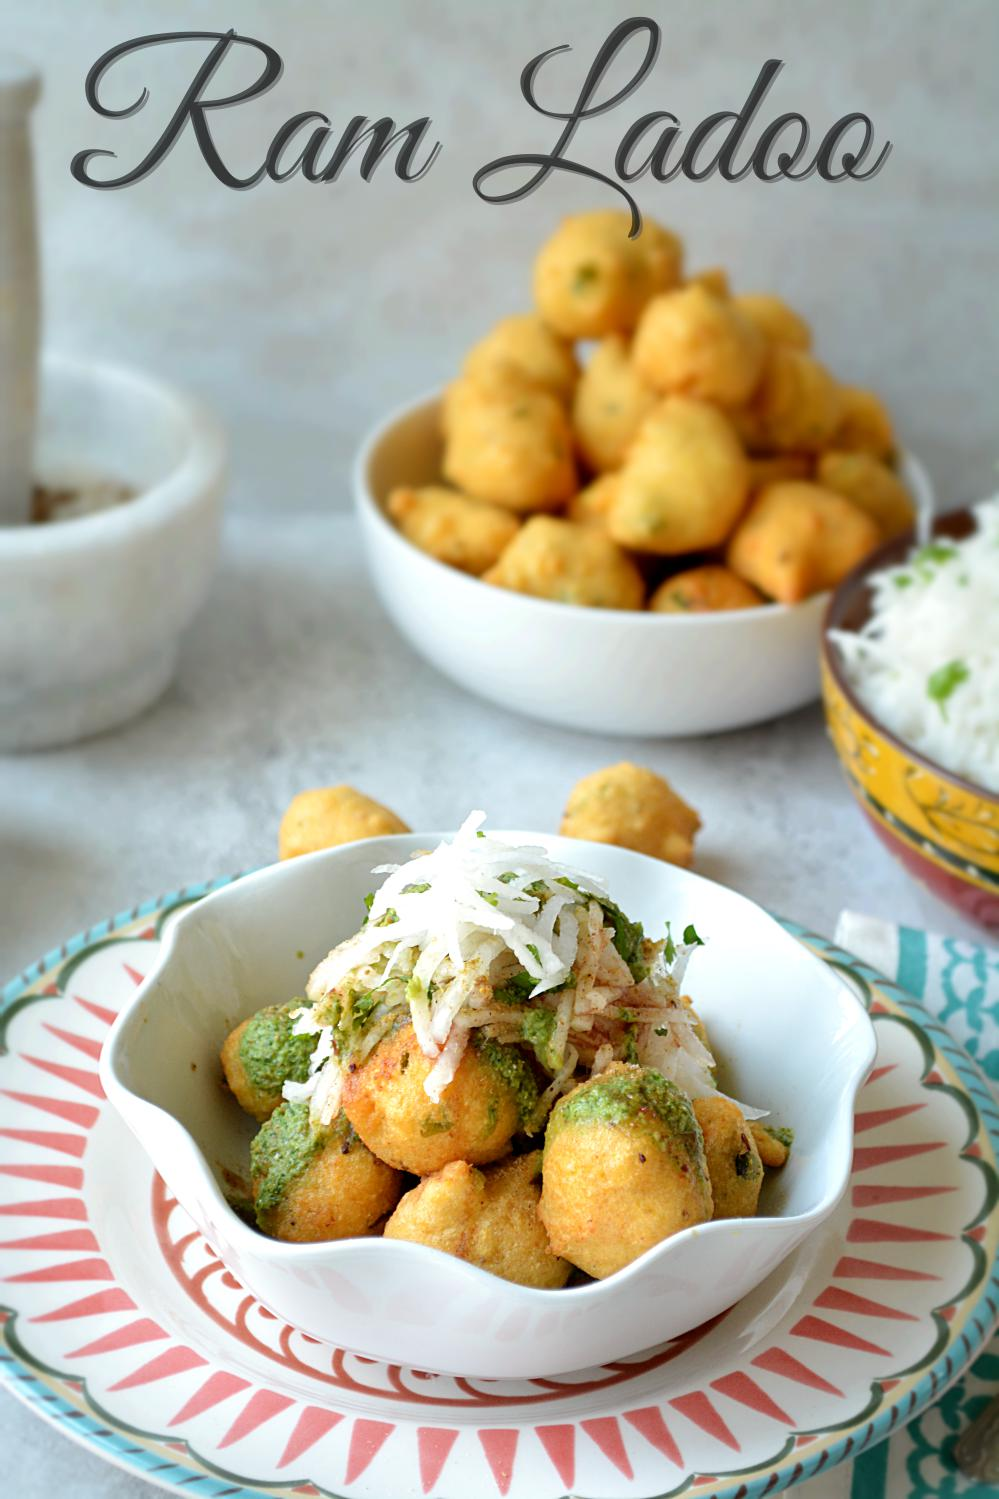 Ram Ladoo recipe - Ruchiskitchen